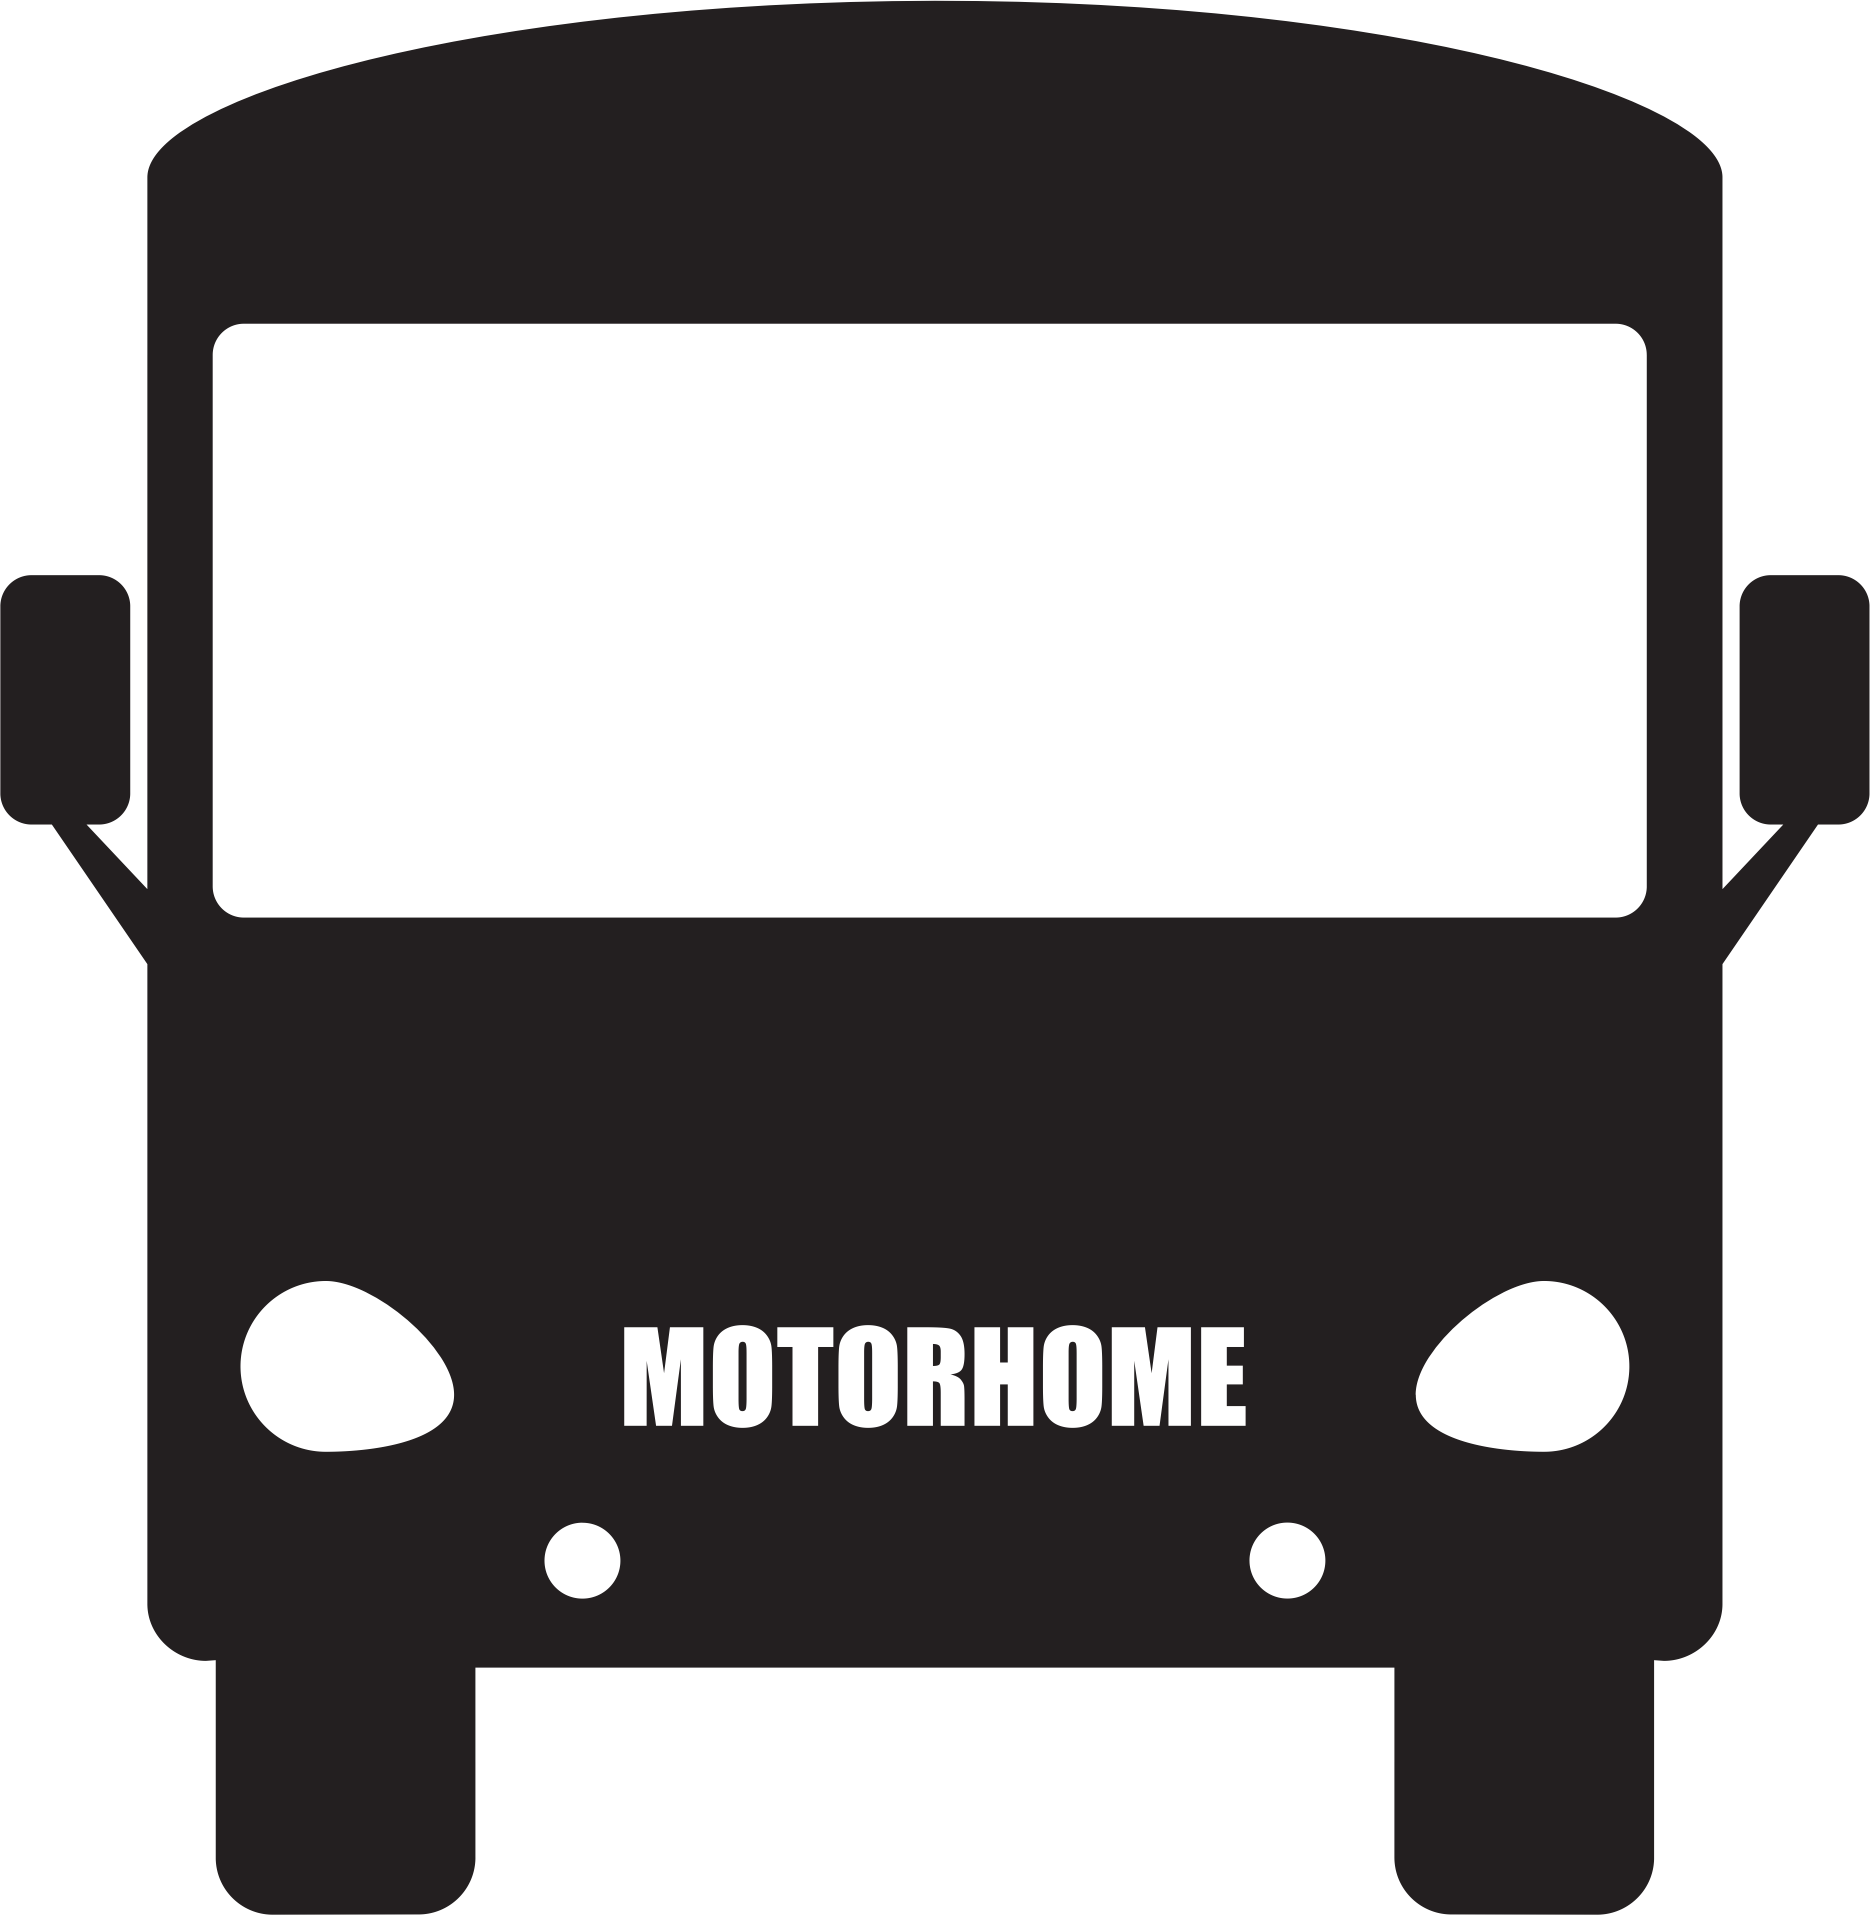 Coach clipart motor coach. Motorhome silhouette big image